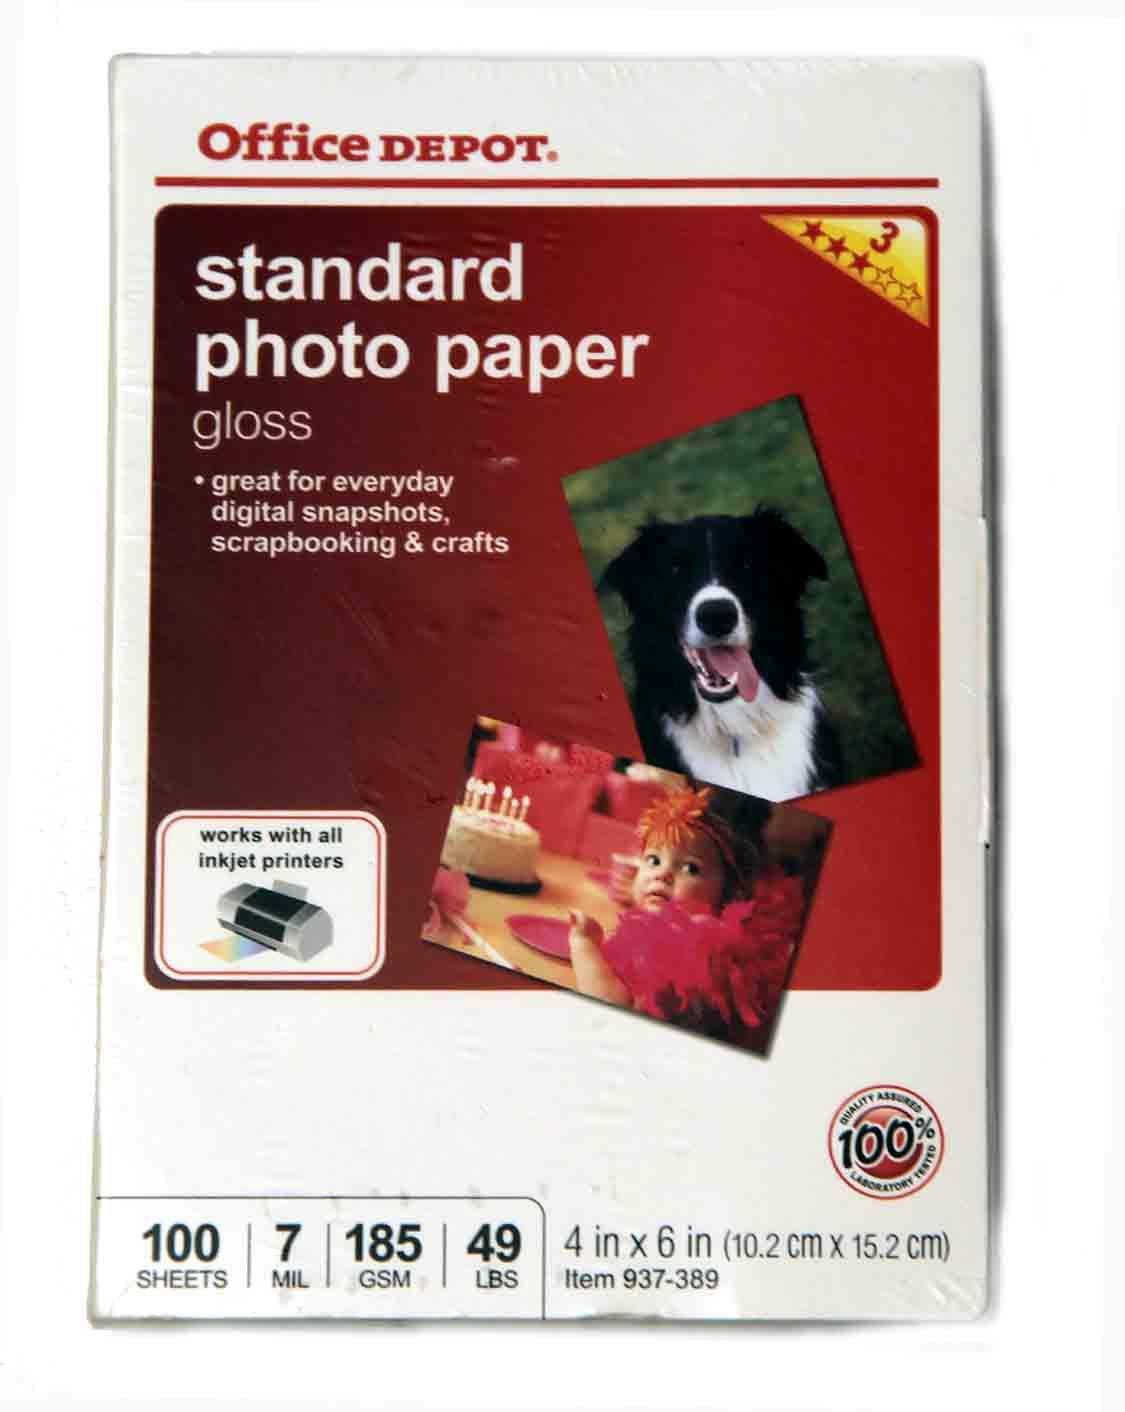 Office Depot Standard Photo Paper Gloass 4X6 Inkjet 100 Sheets